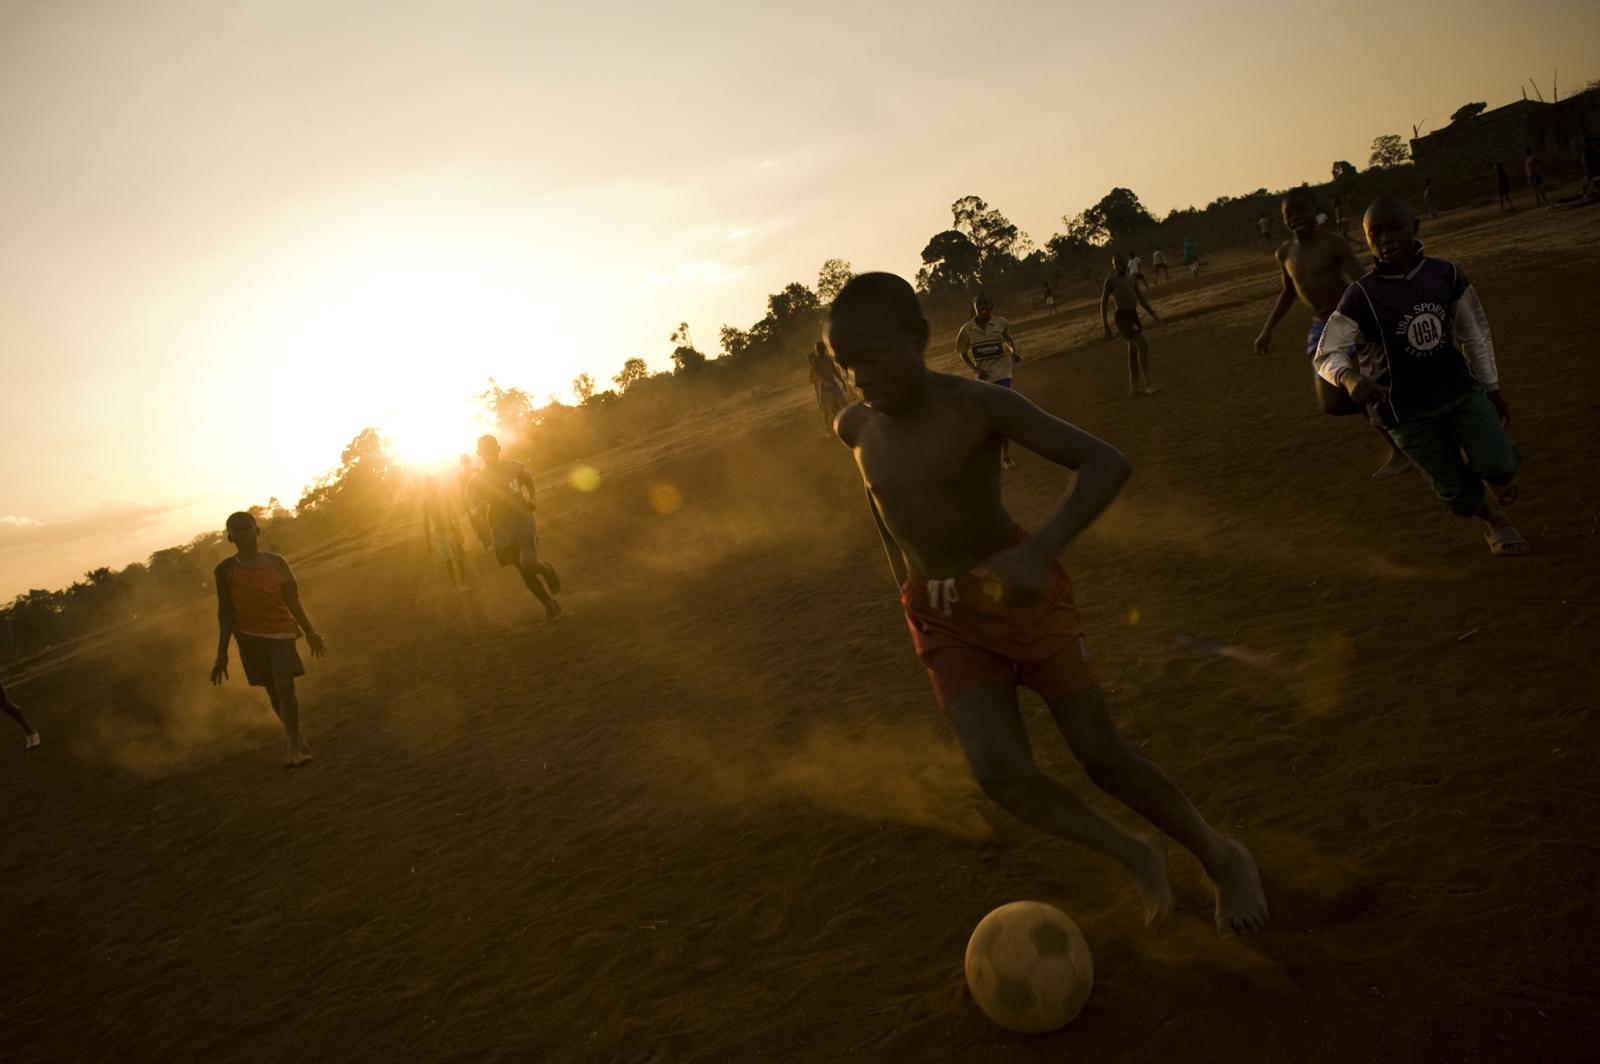 Kenya. Children playing soccer in the Kibera slum. Kibera is Africa`s next largest slum and located in Nairobi.